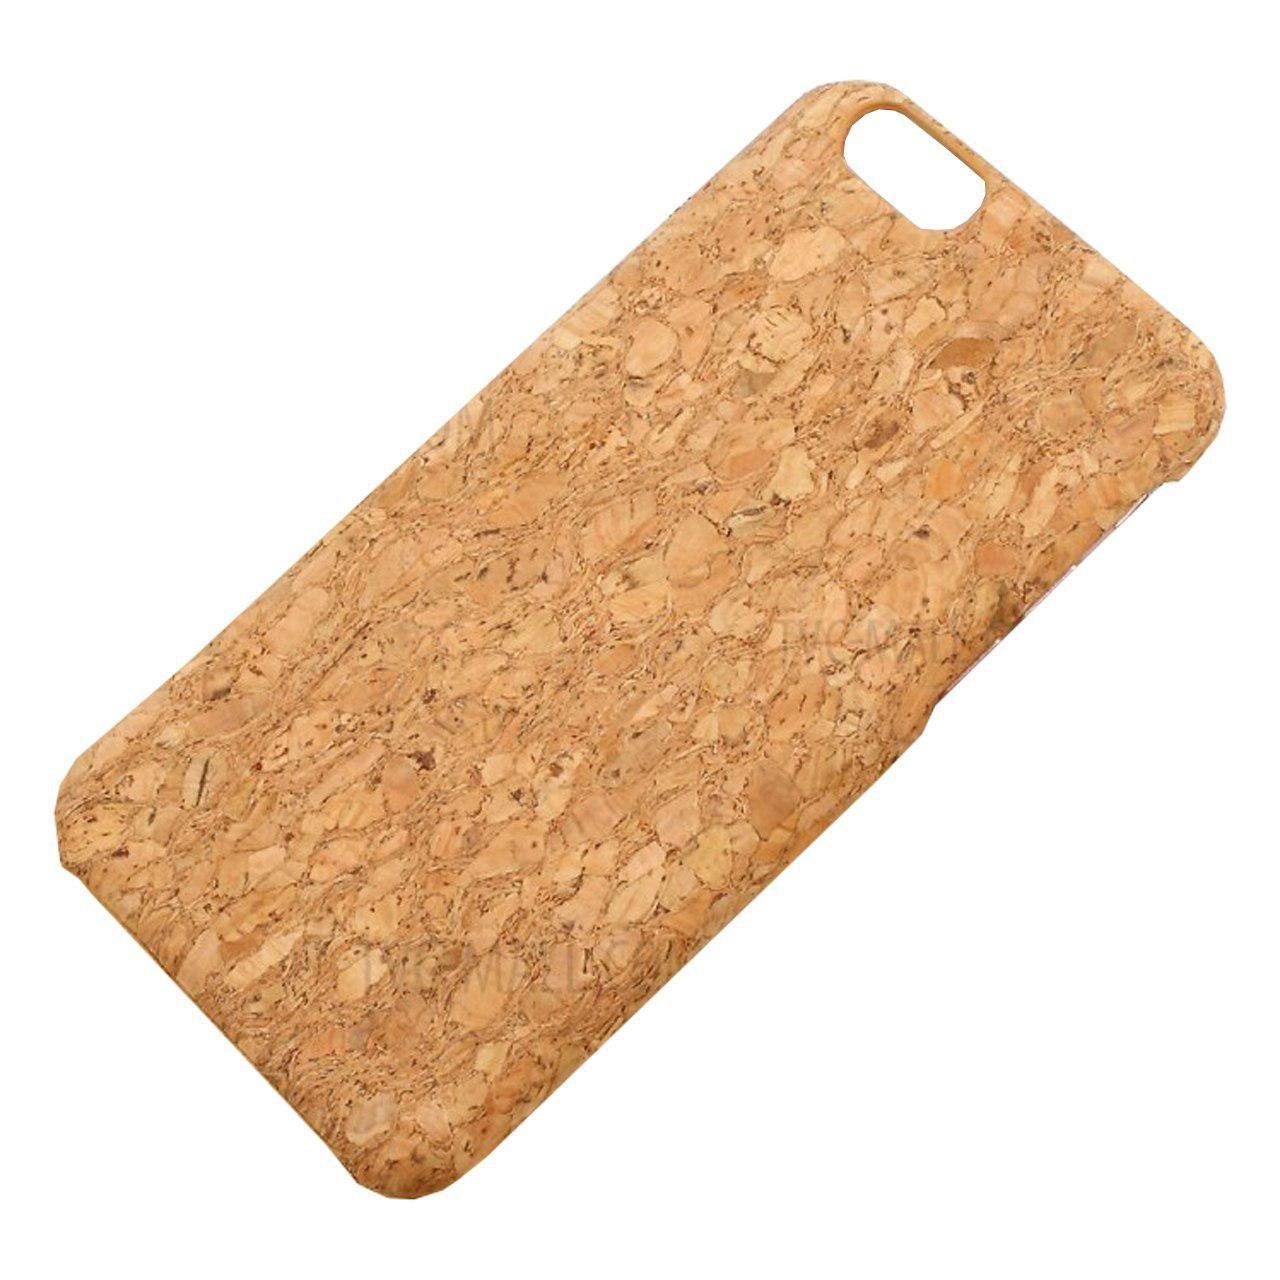 کاور کویا مدل Wood 3 مناسب برای گوشی موبایل آیفون 6/6s